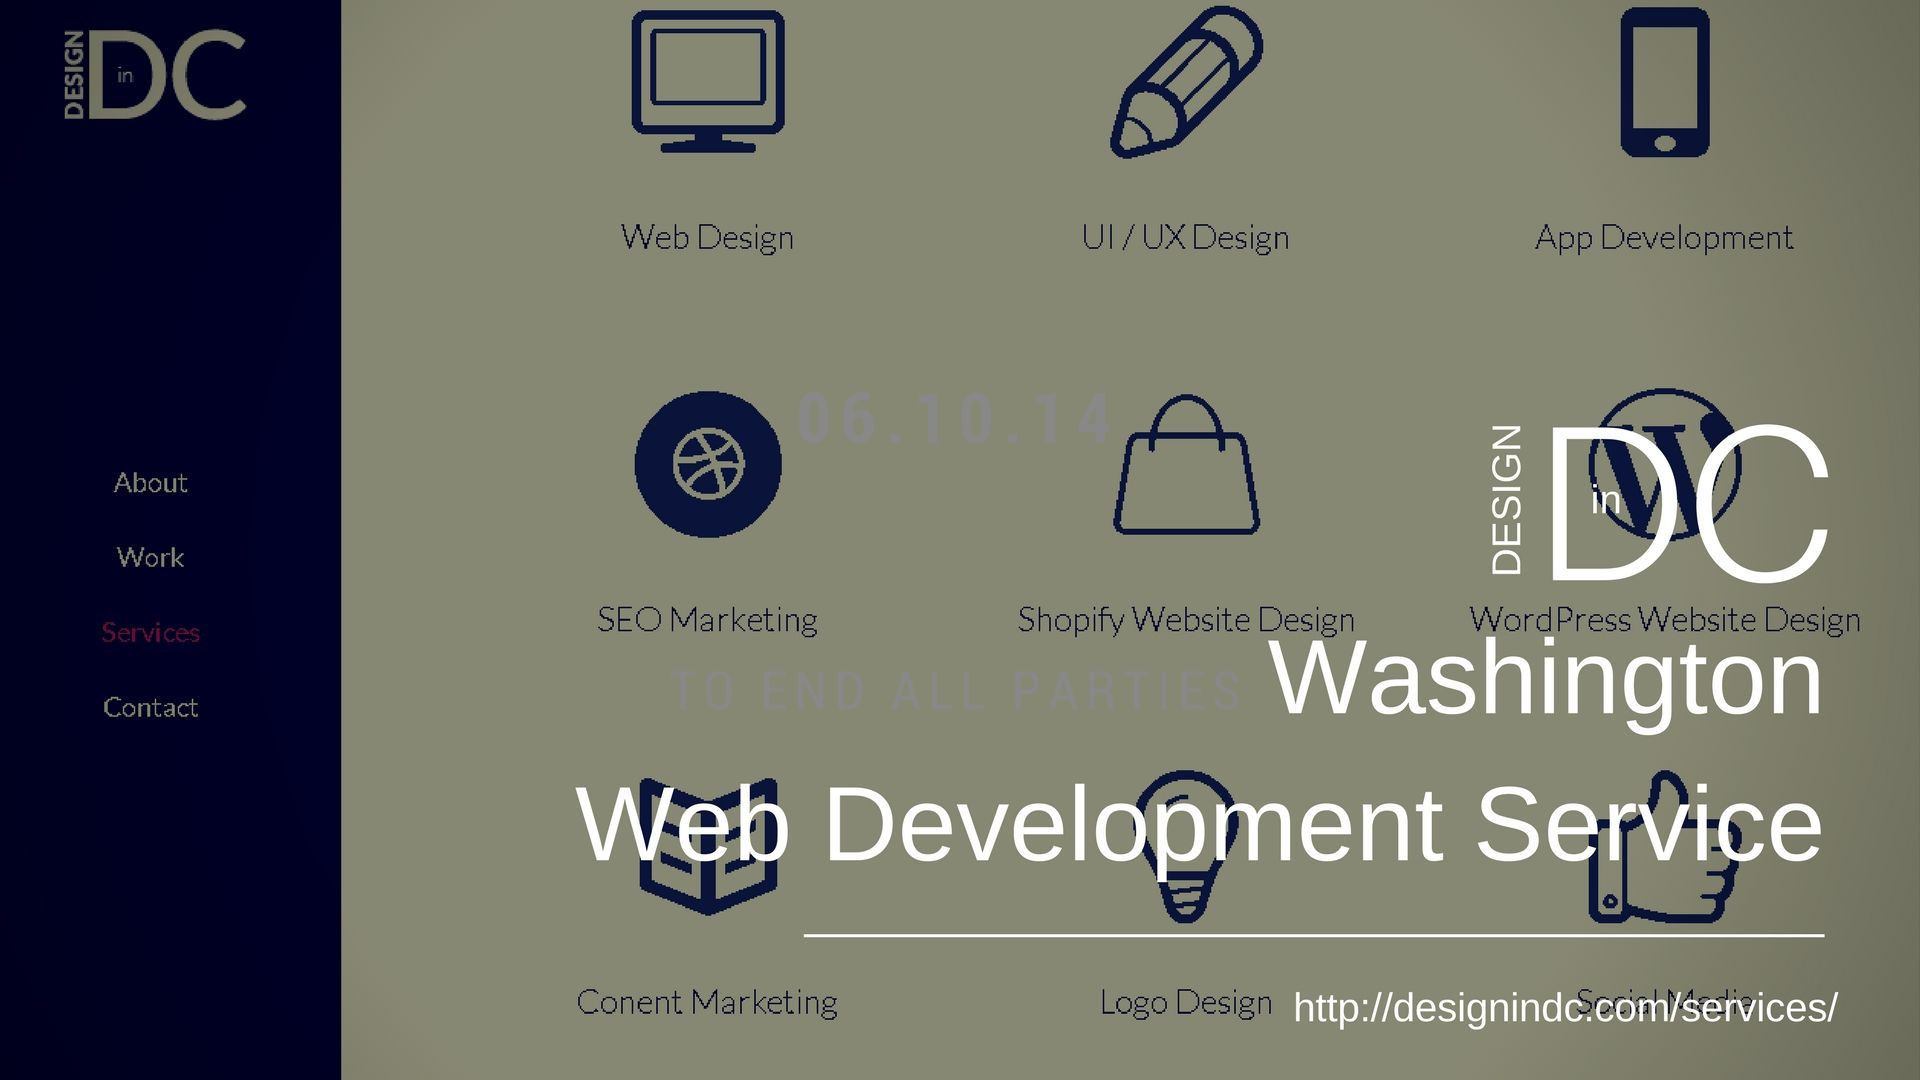 Web Design Development Seo Services Washington Dc Shopify Website Design Website Design Wordpress Web Development